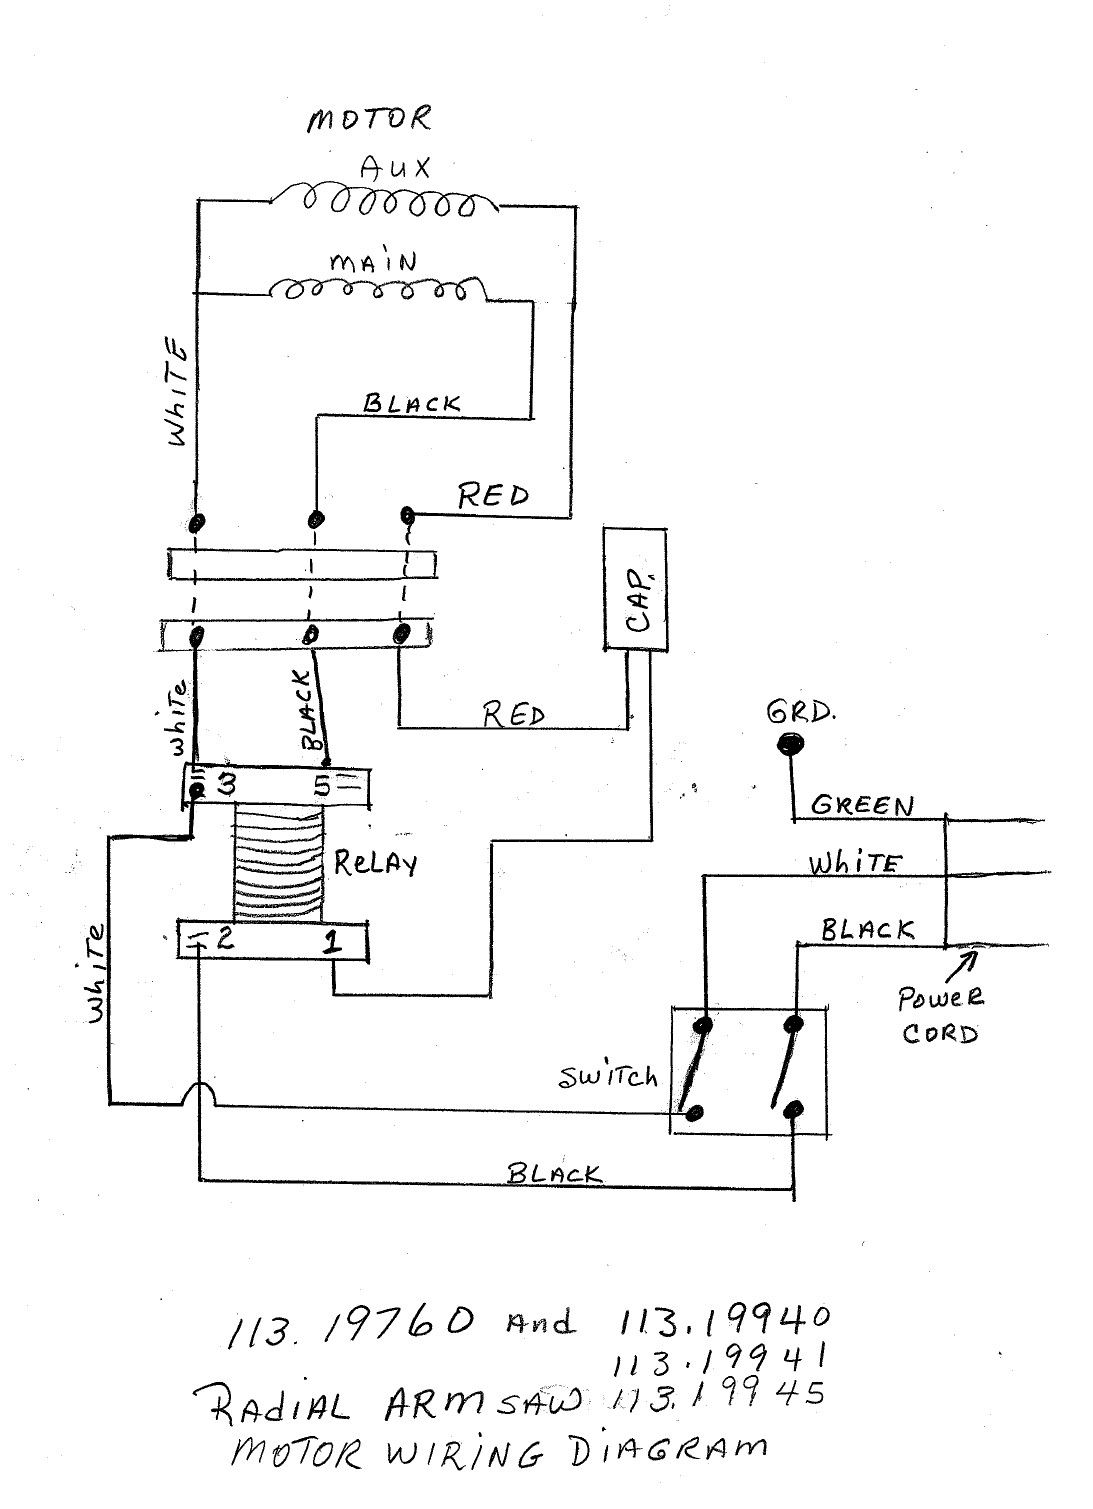 table saw wiring diagram 120v wiring diagrams schematable saw wiring diagram manual wiring schematic diagram arc welder wiring diagram table saw wiring diagram 120v